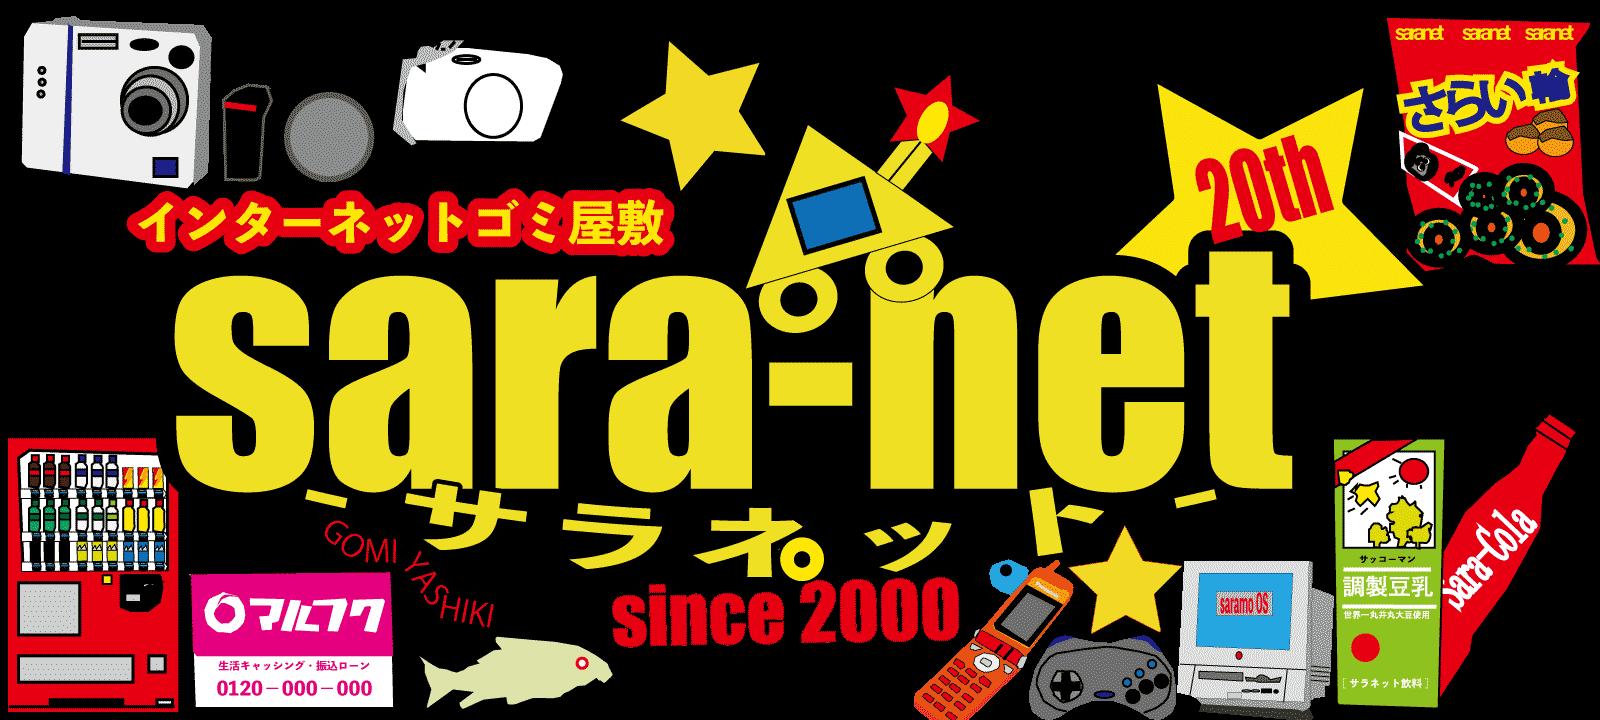 sara-net -サラネット-インターネットゴミ屋敷